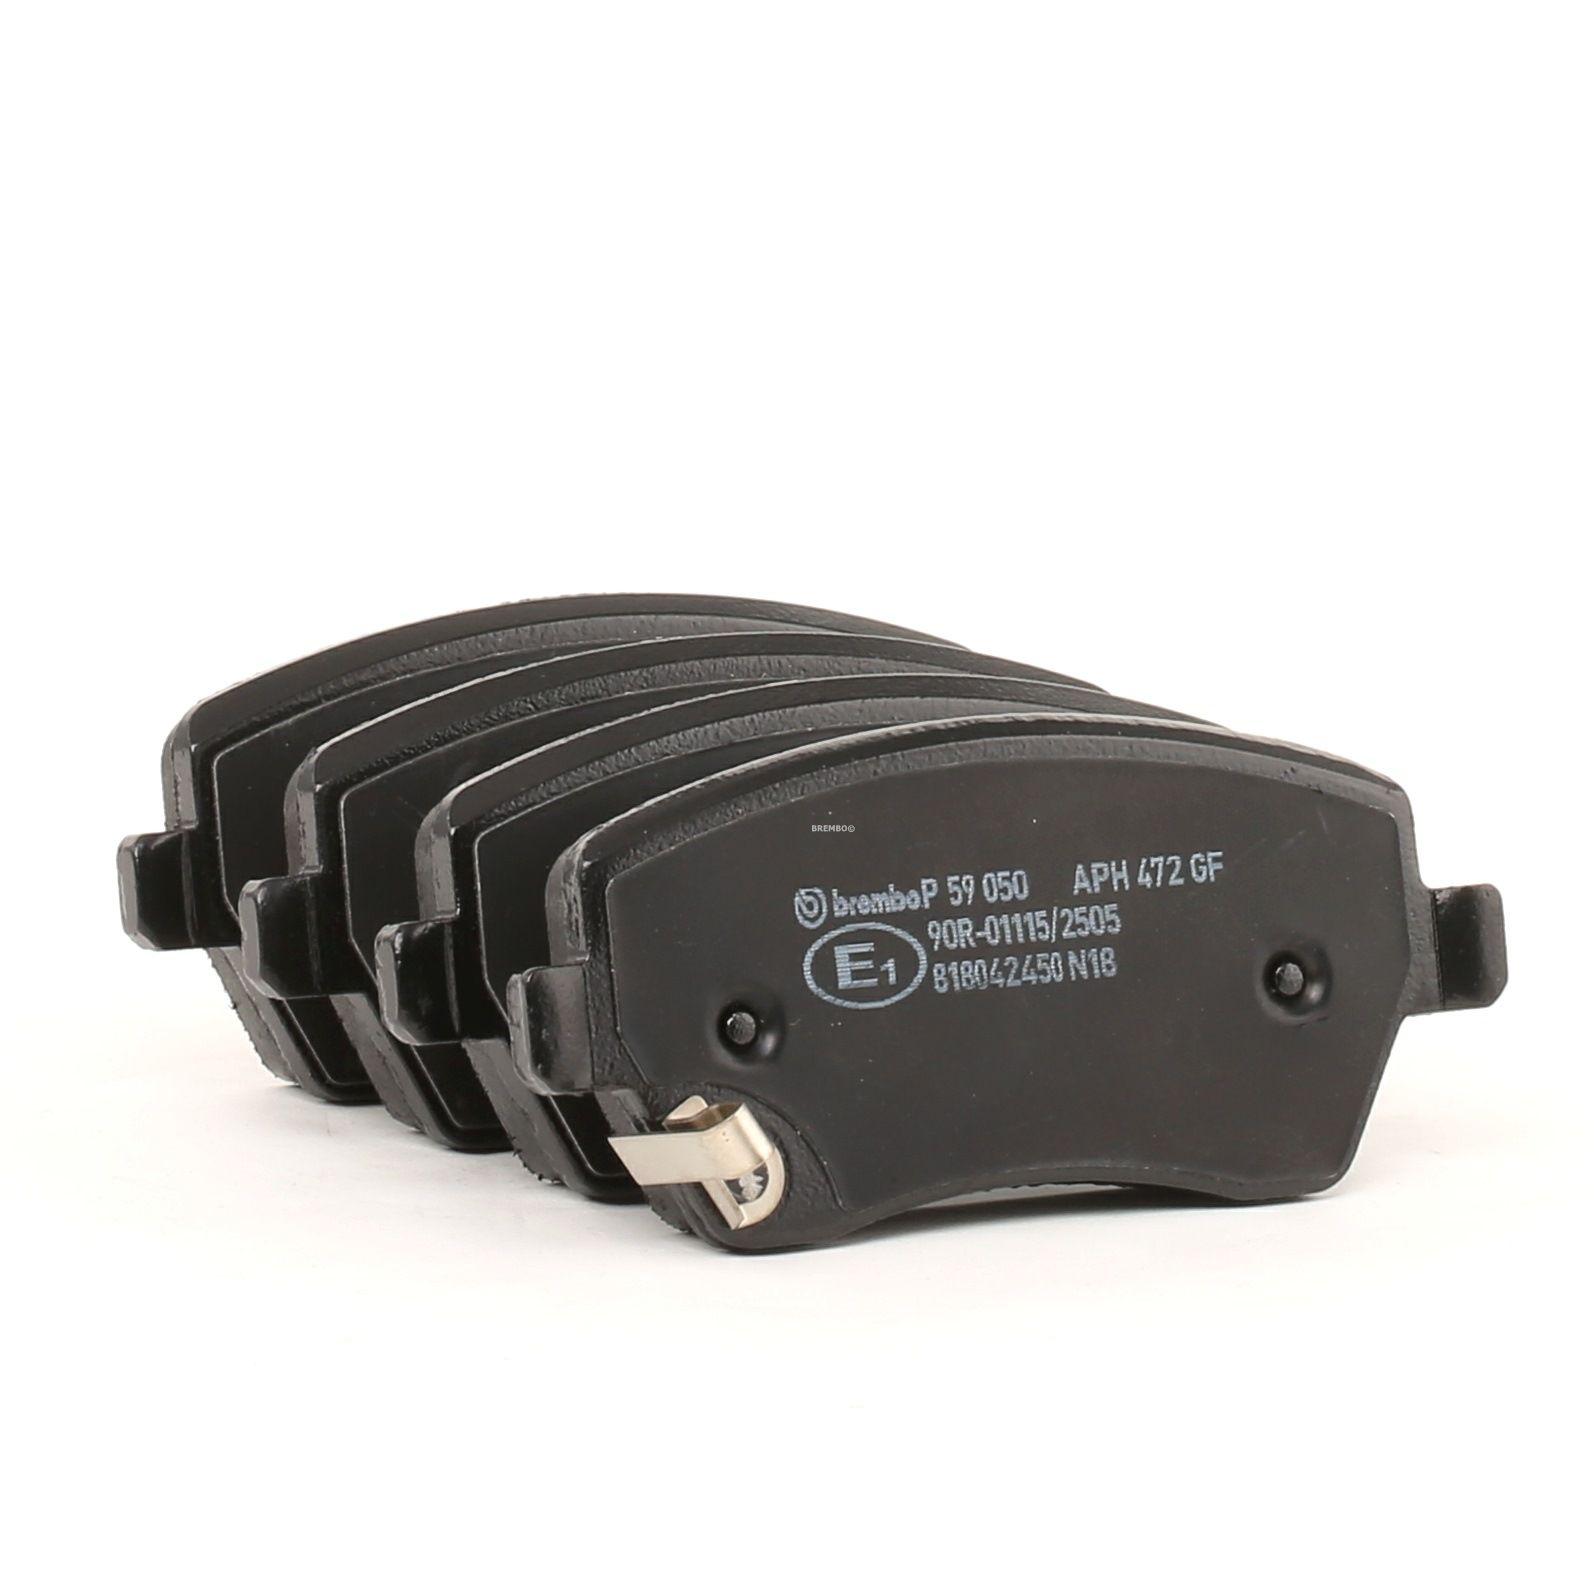 Disk brake pads BREMBO D14918691 rating